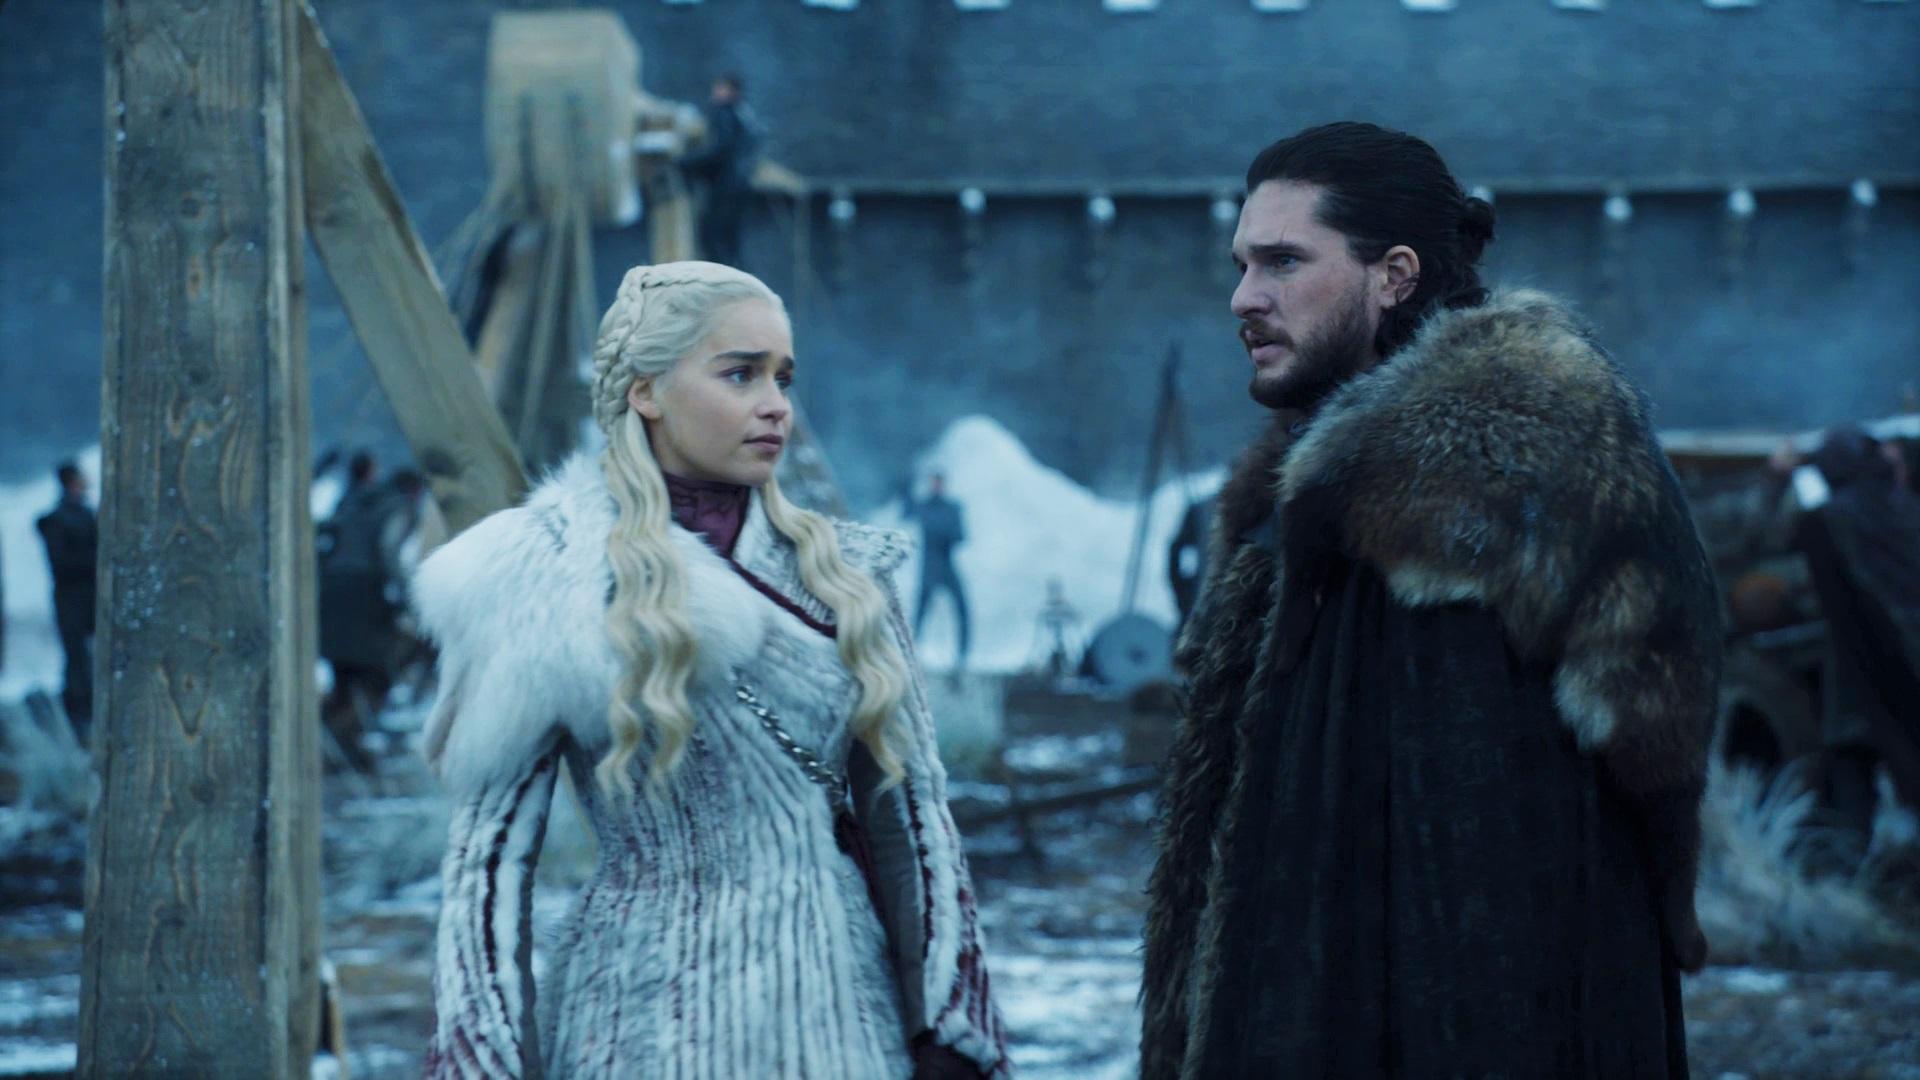 Jon Snow Daenerys Targaryen Season 8 801 Winterfell